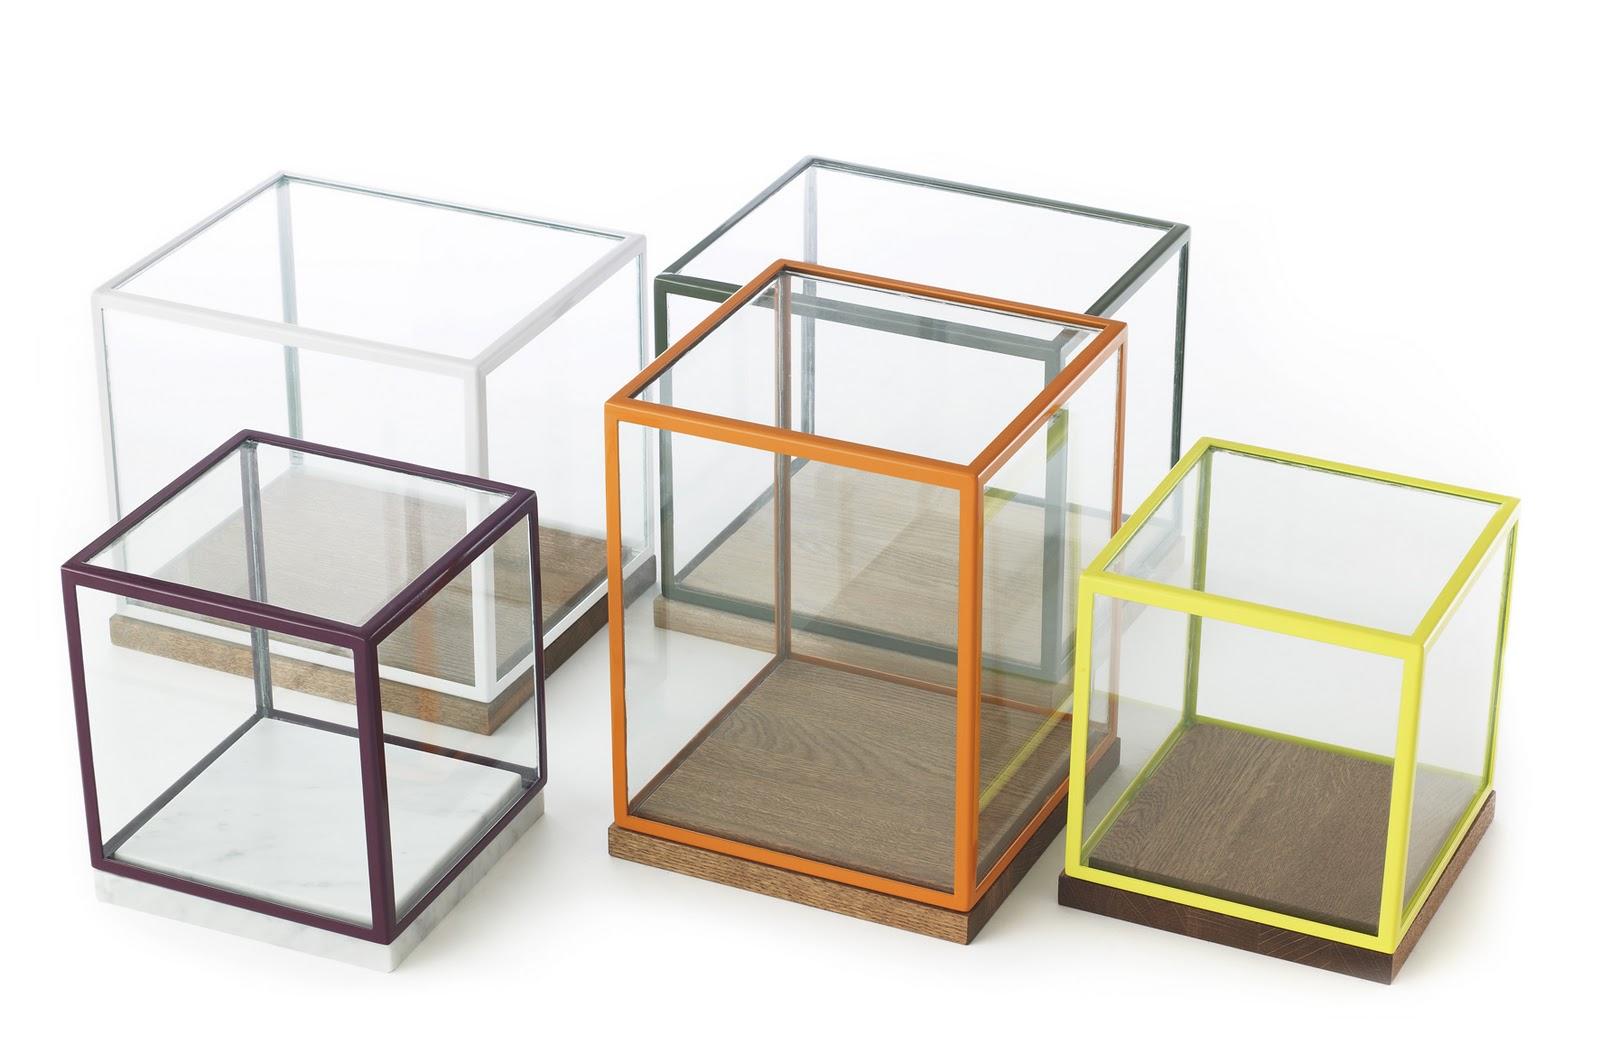 Annettes skimmer tittsk p - Vitrinas de cristal para colecciones ...